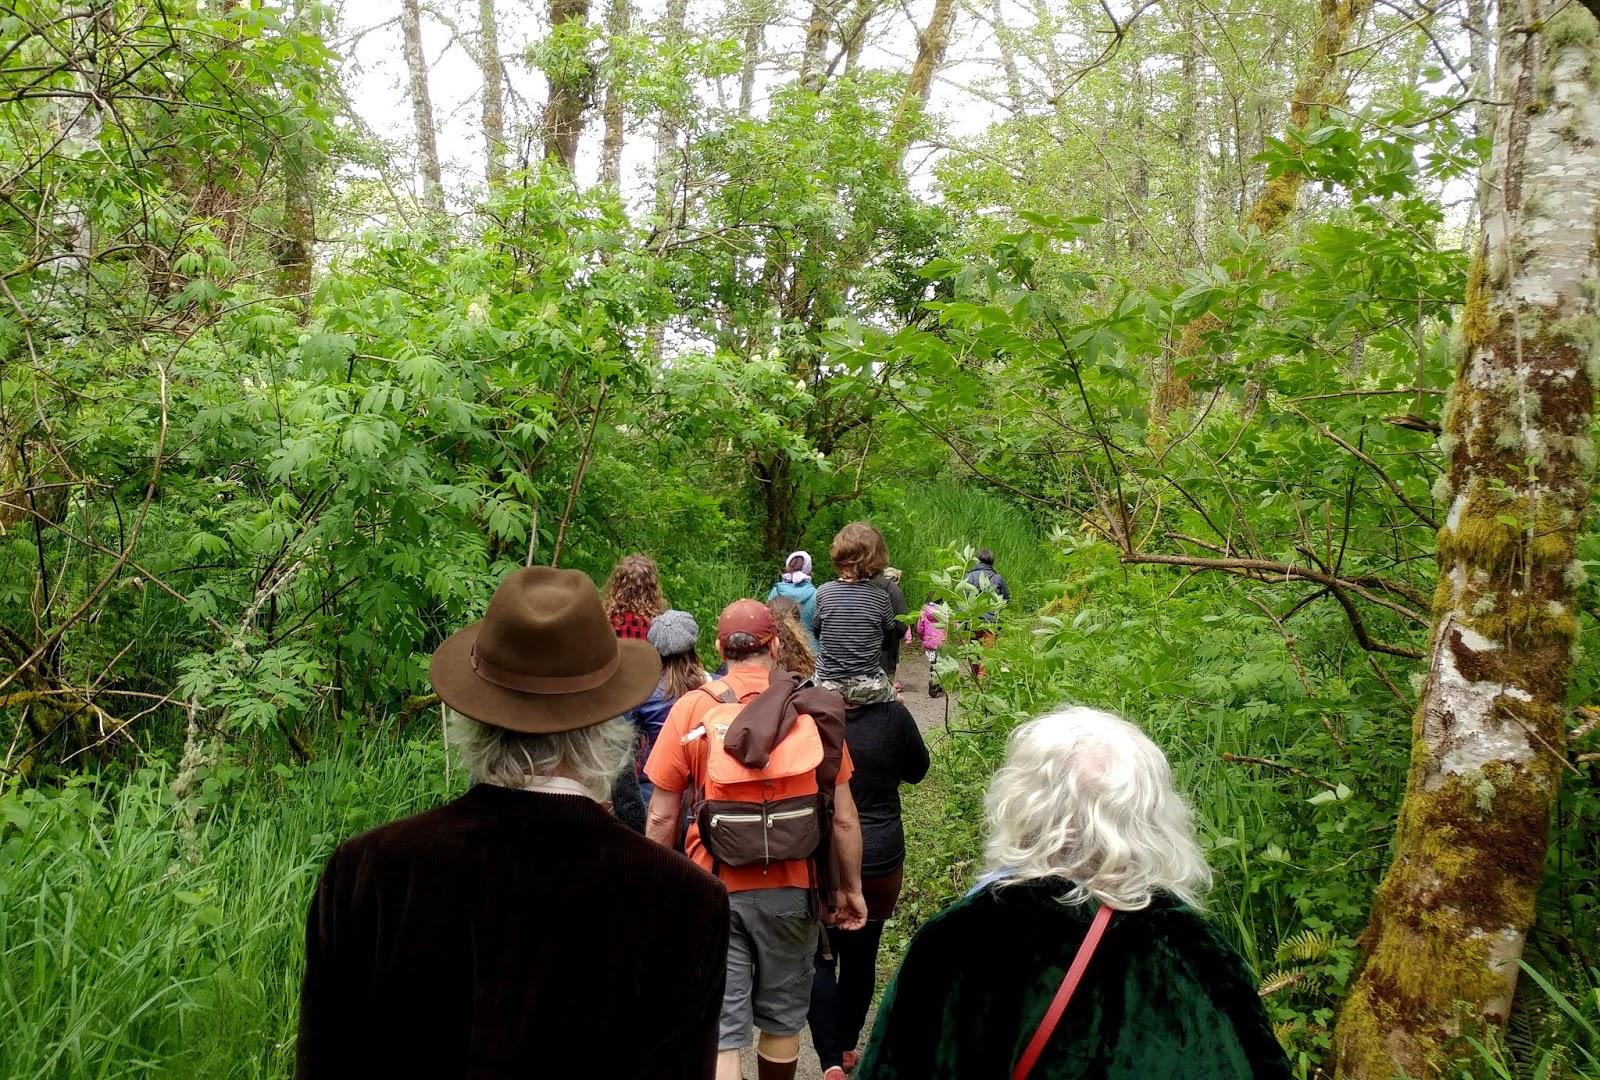 Oregon Art-lovers strolling through the park near Astoria.